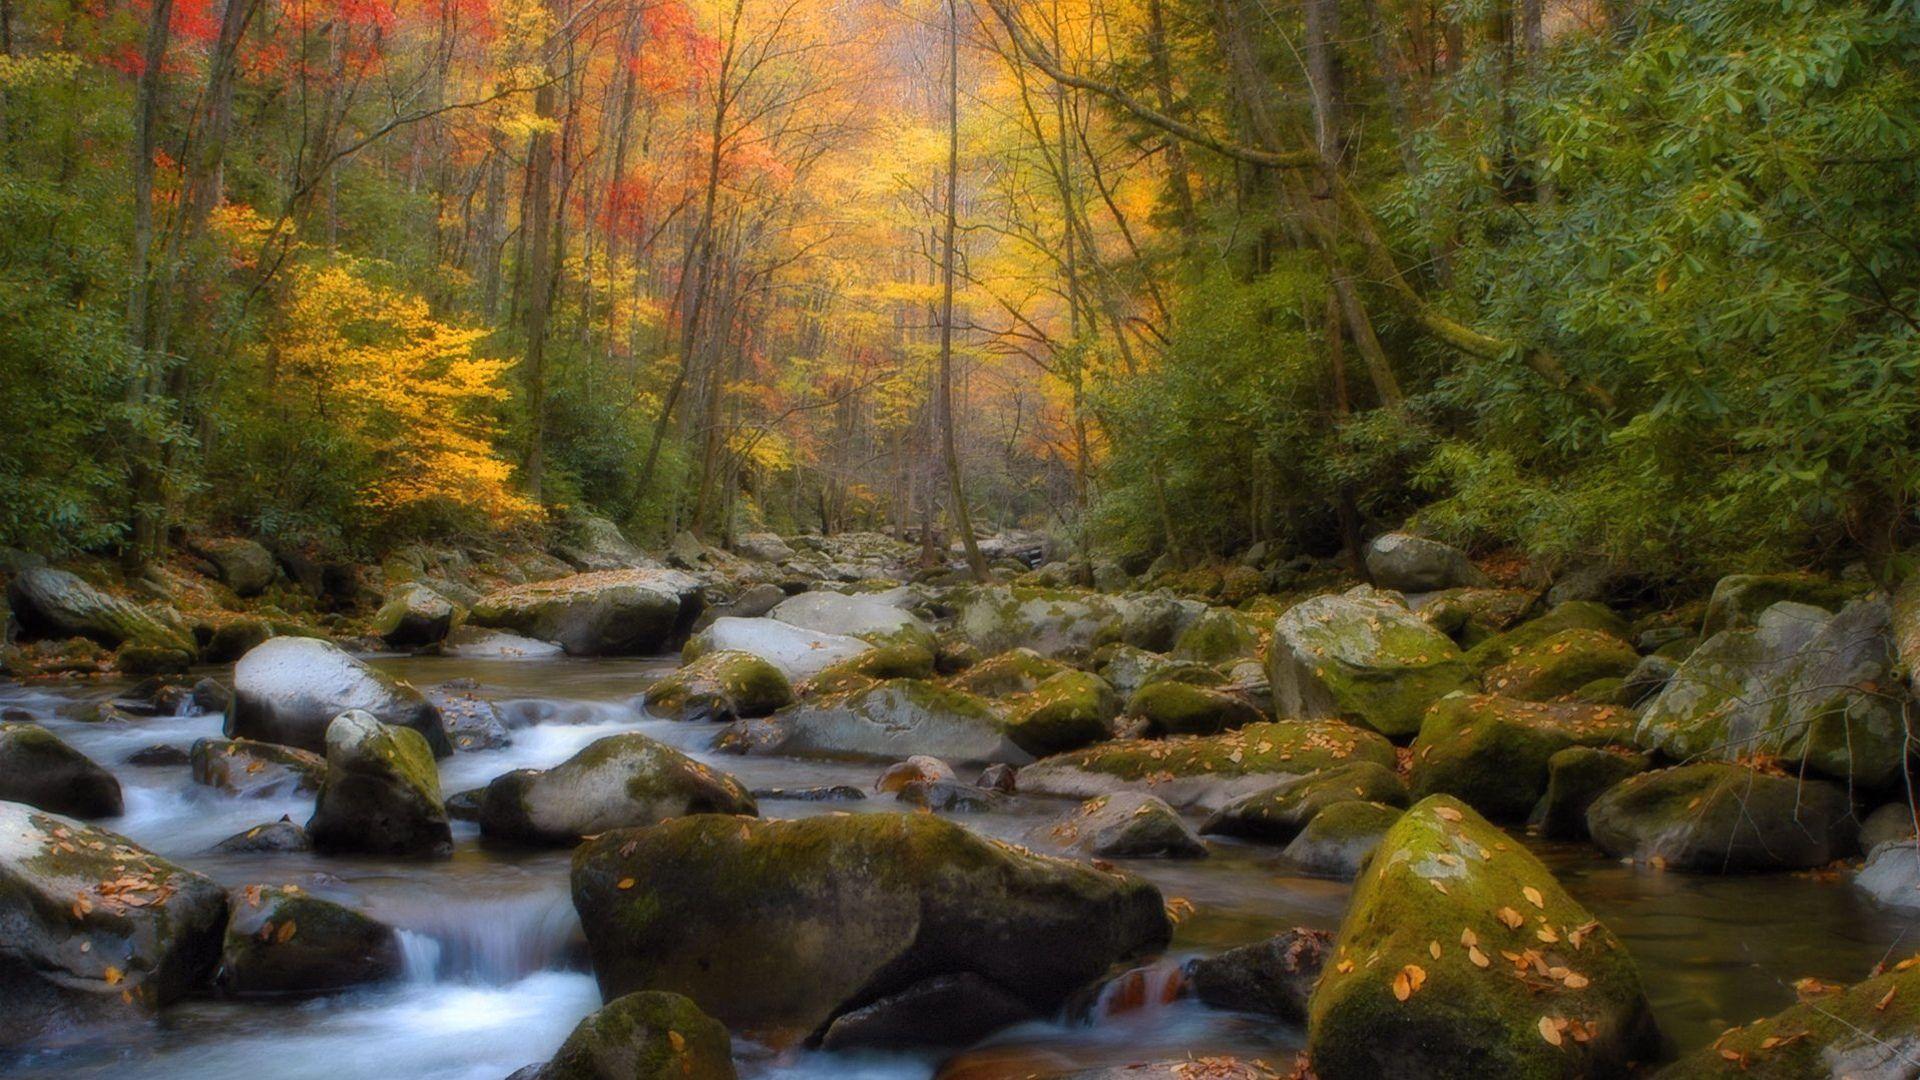 wallpaper spring 23 1080p - photo #2